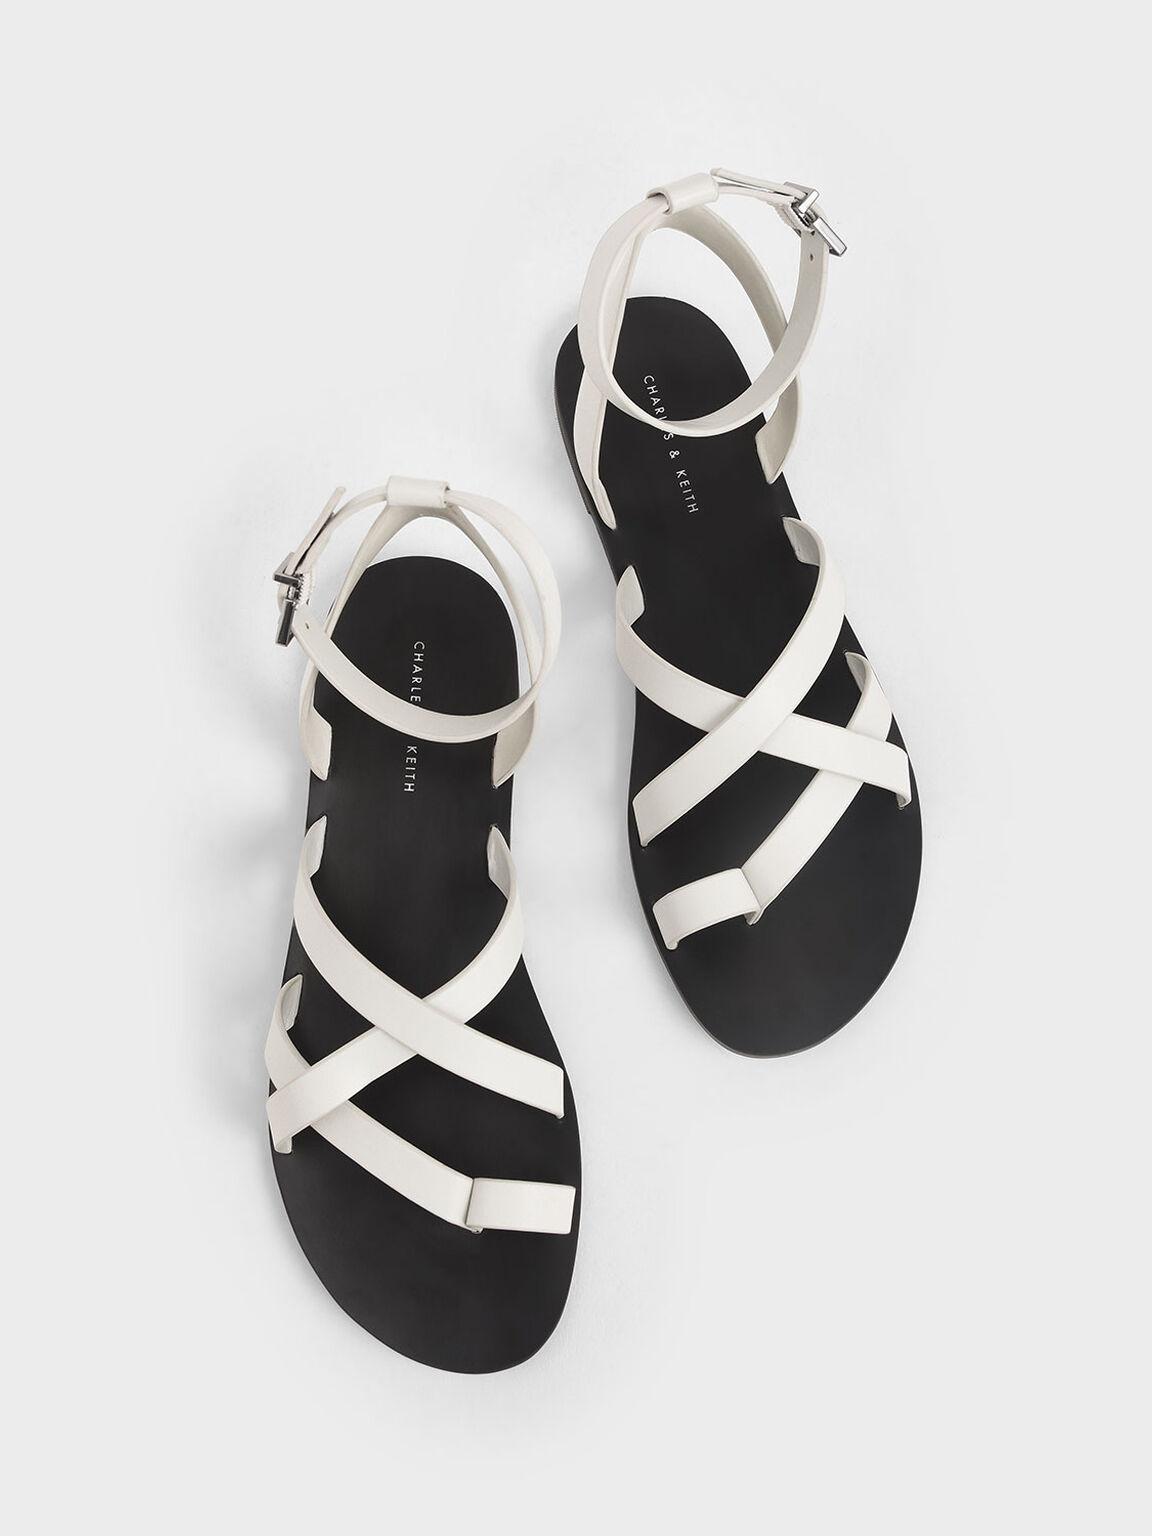 交叉帶趾環涼鞋, 白色, hi-res